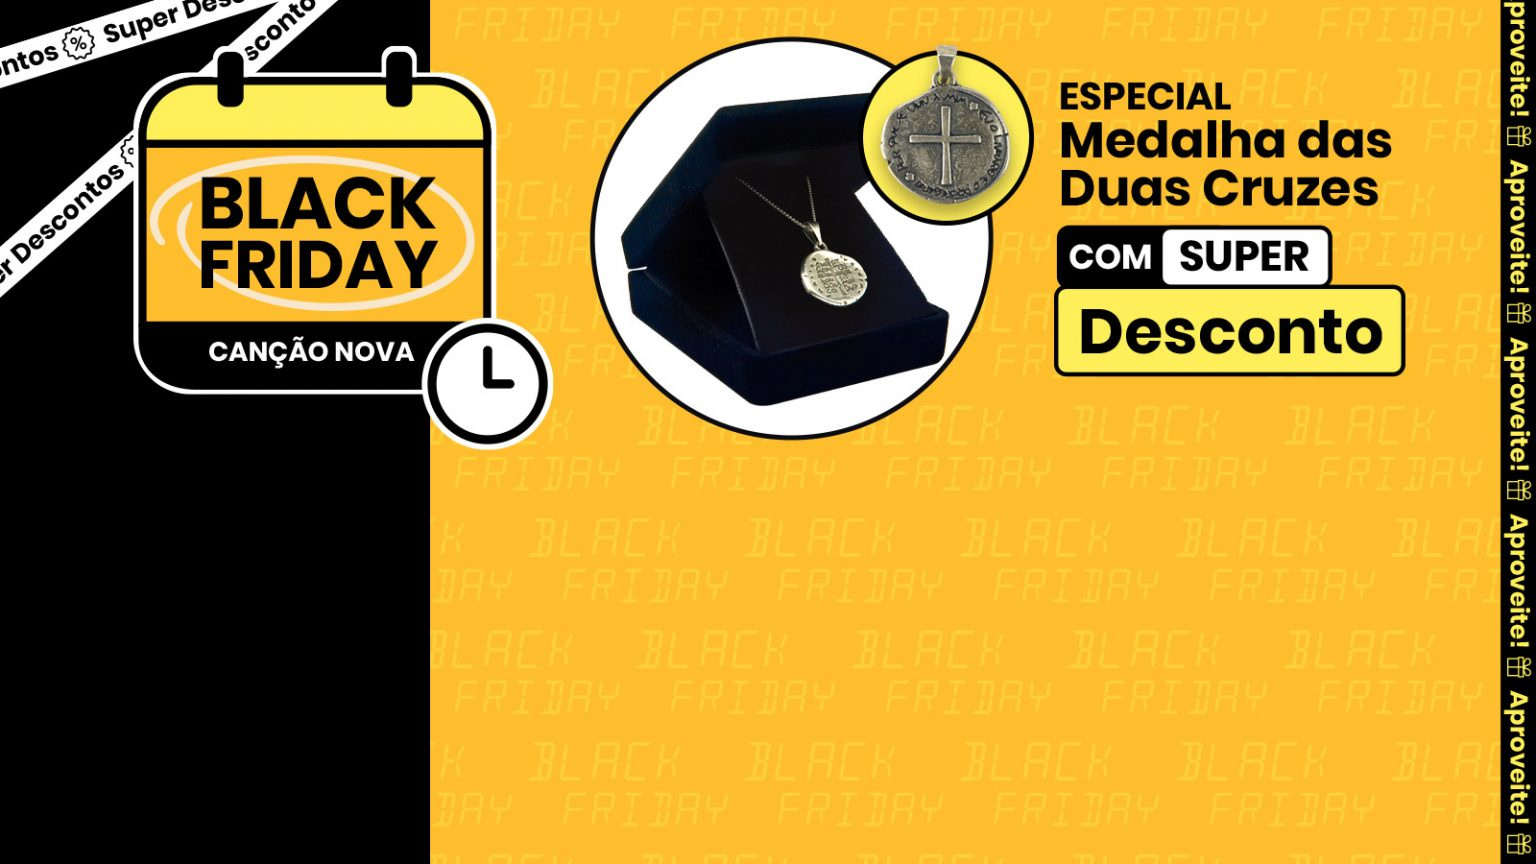 1600x1200_black-Friday_especial-duas-cruzes-1536x864.jpg